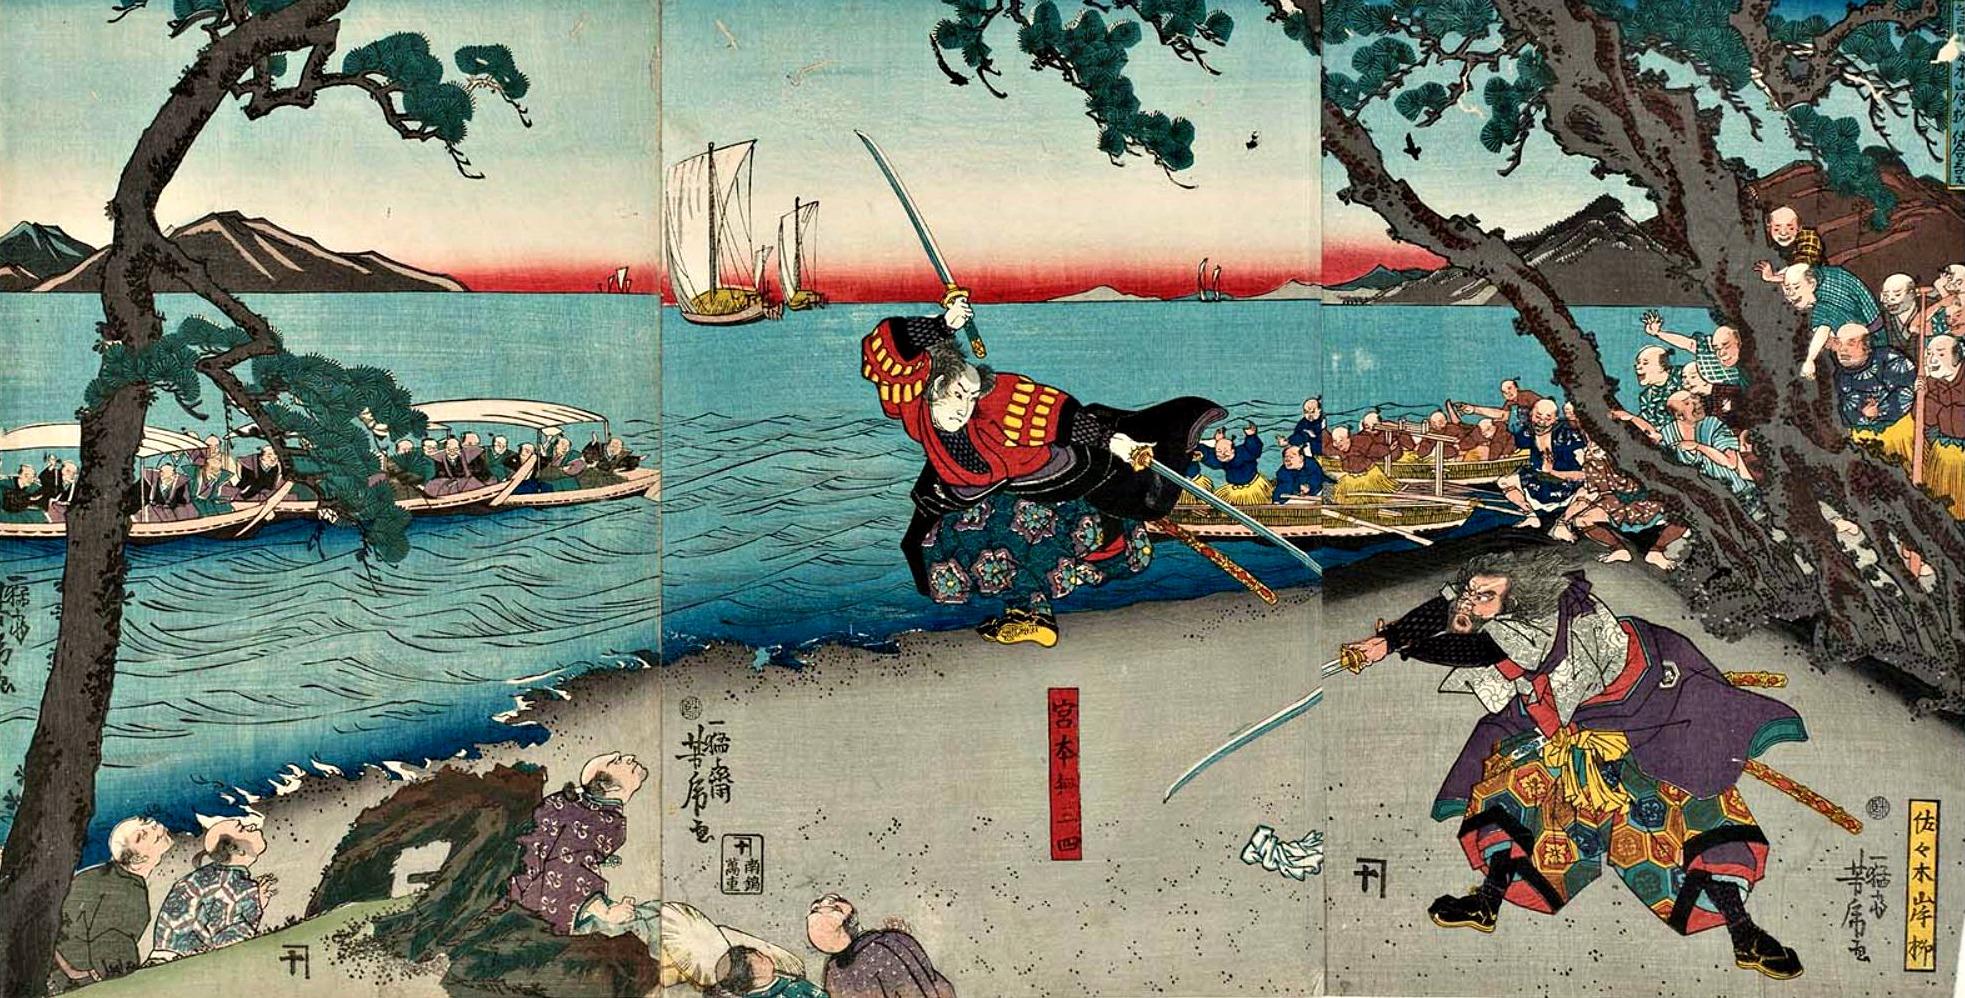 swordsman online lost art complete guide